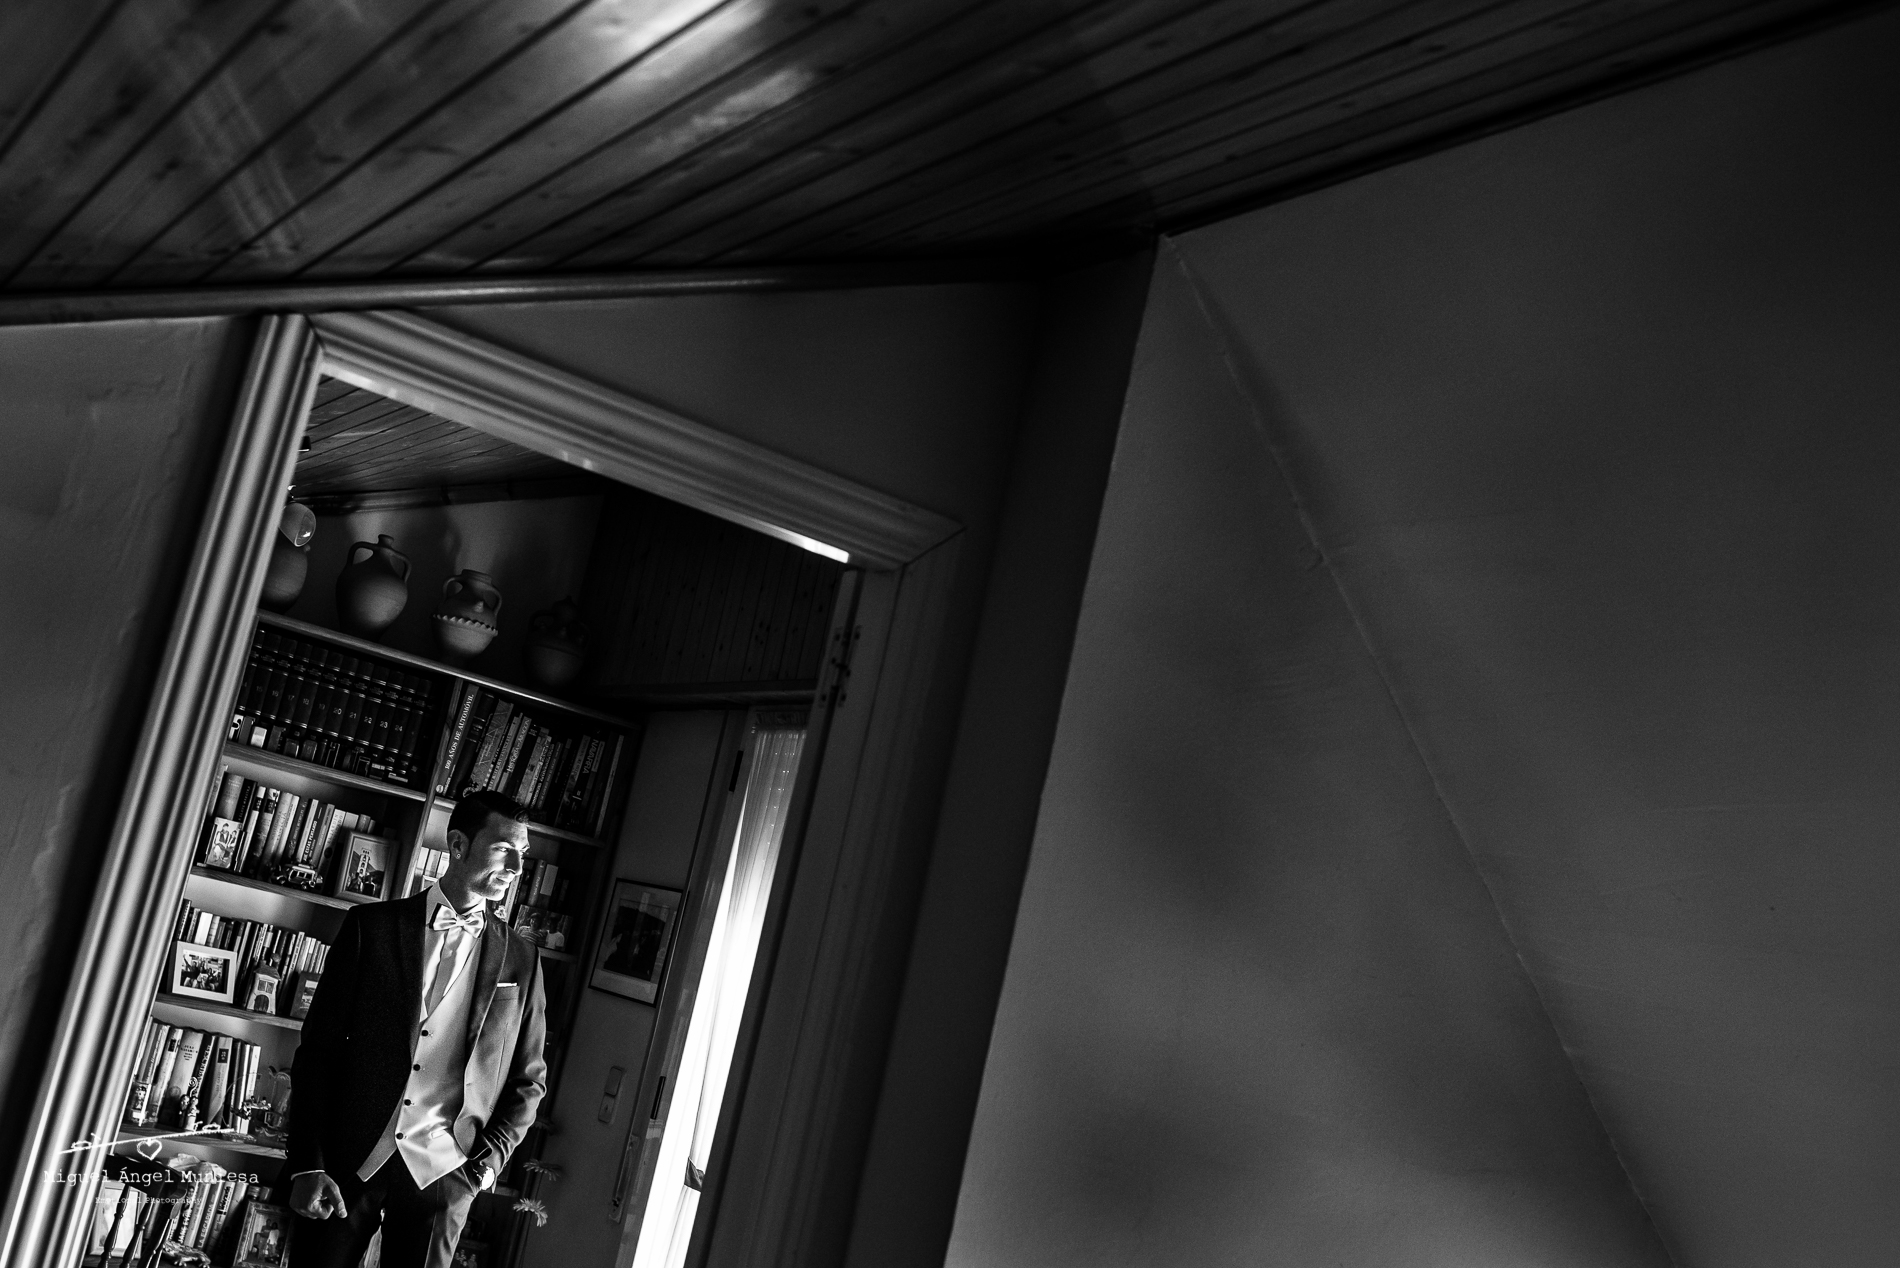 boda, fotografia de boda, boda zaragoza, fotografia, wedding, wedding photography, miguel angel muniesa, fotografo boda Zaragoza, fotografo boda, destination wedding_ 016